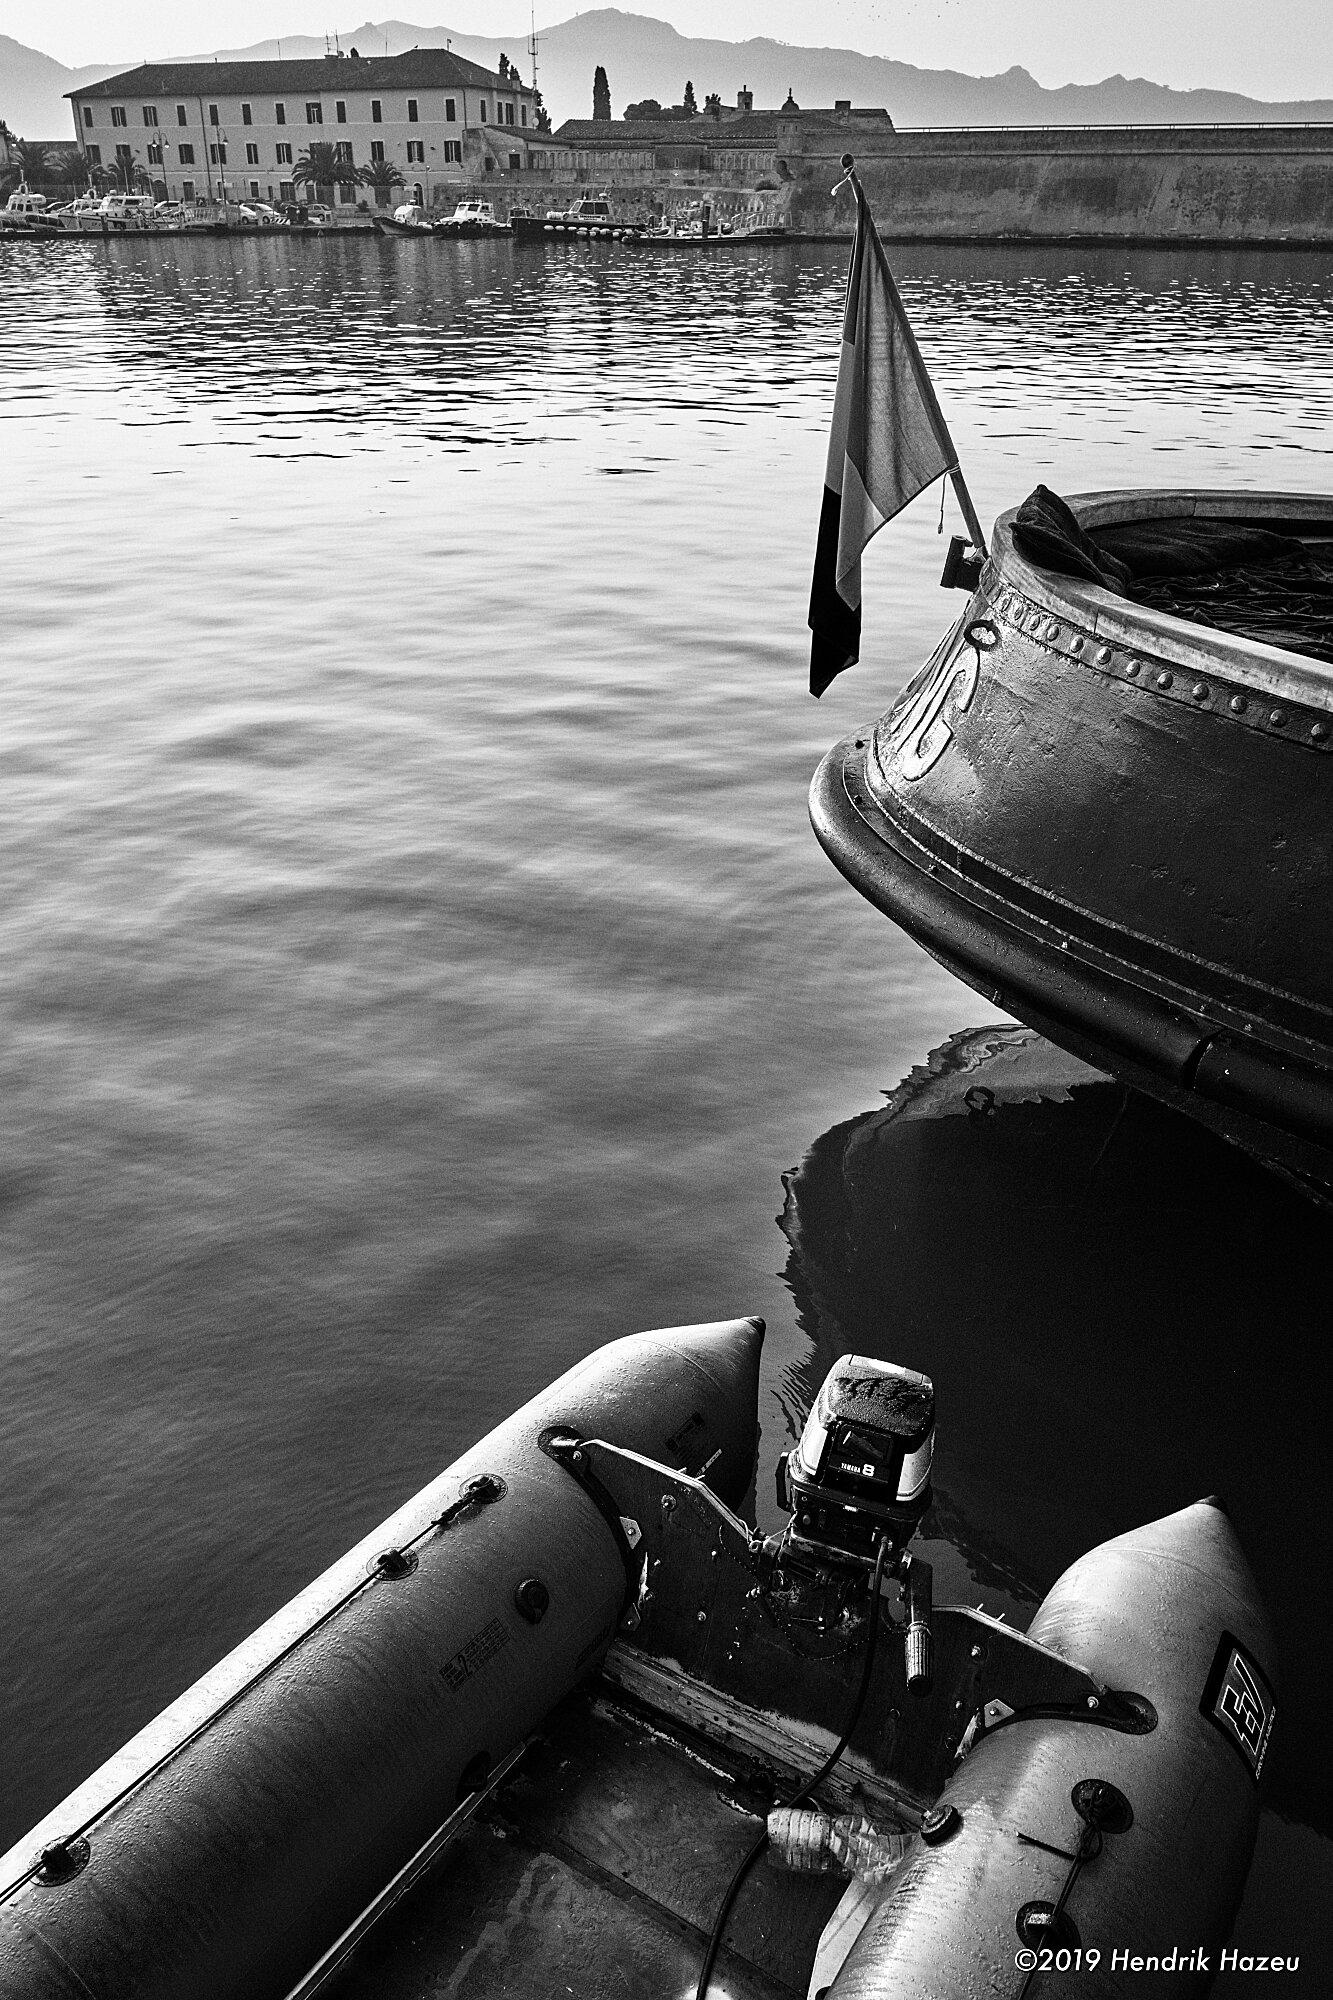 Tugboat's & dinghy's stern (= rear end ;-) … X-Pro2 & XF 18mm F/2 @F/8, 1/100 sec, ISO 200, -0.7 EV